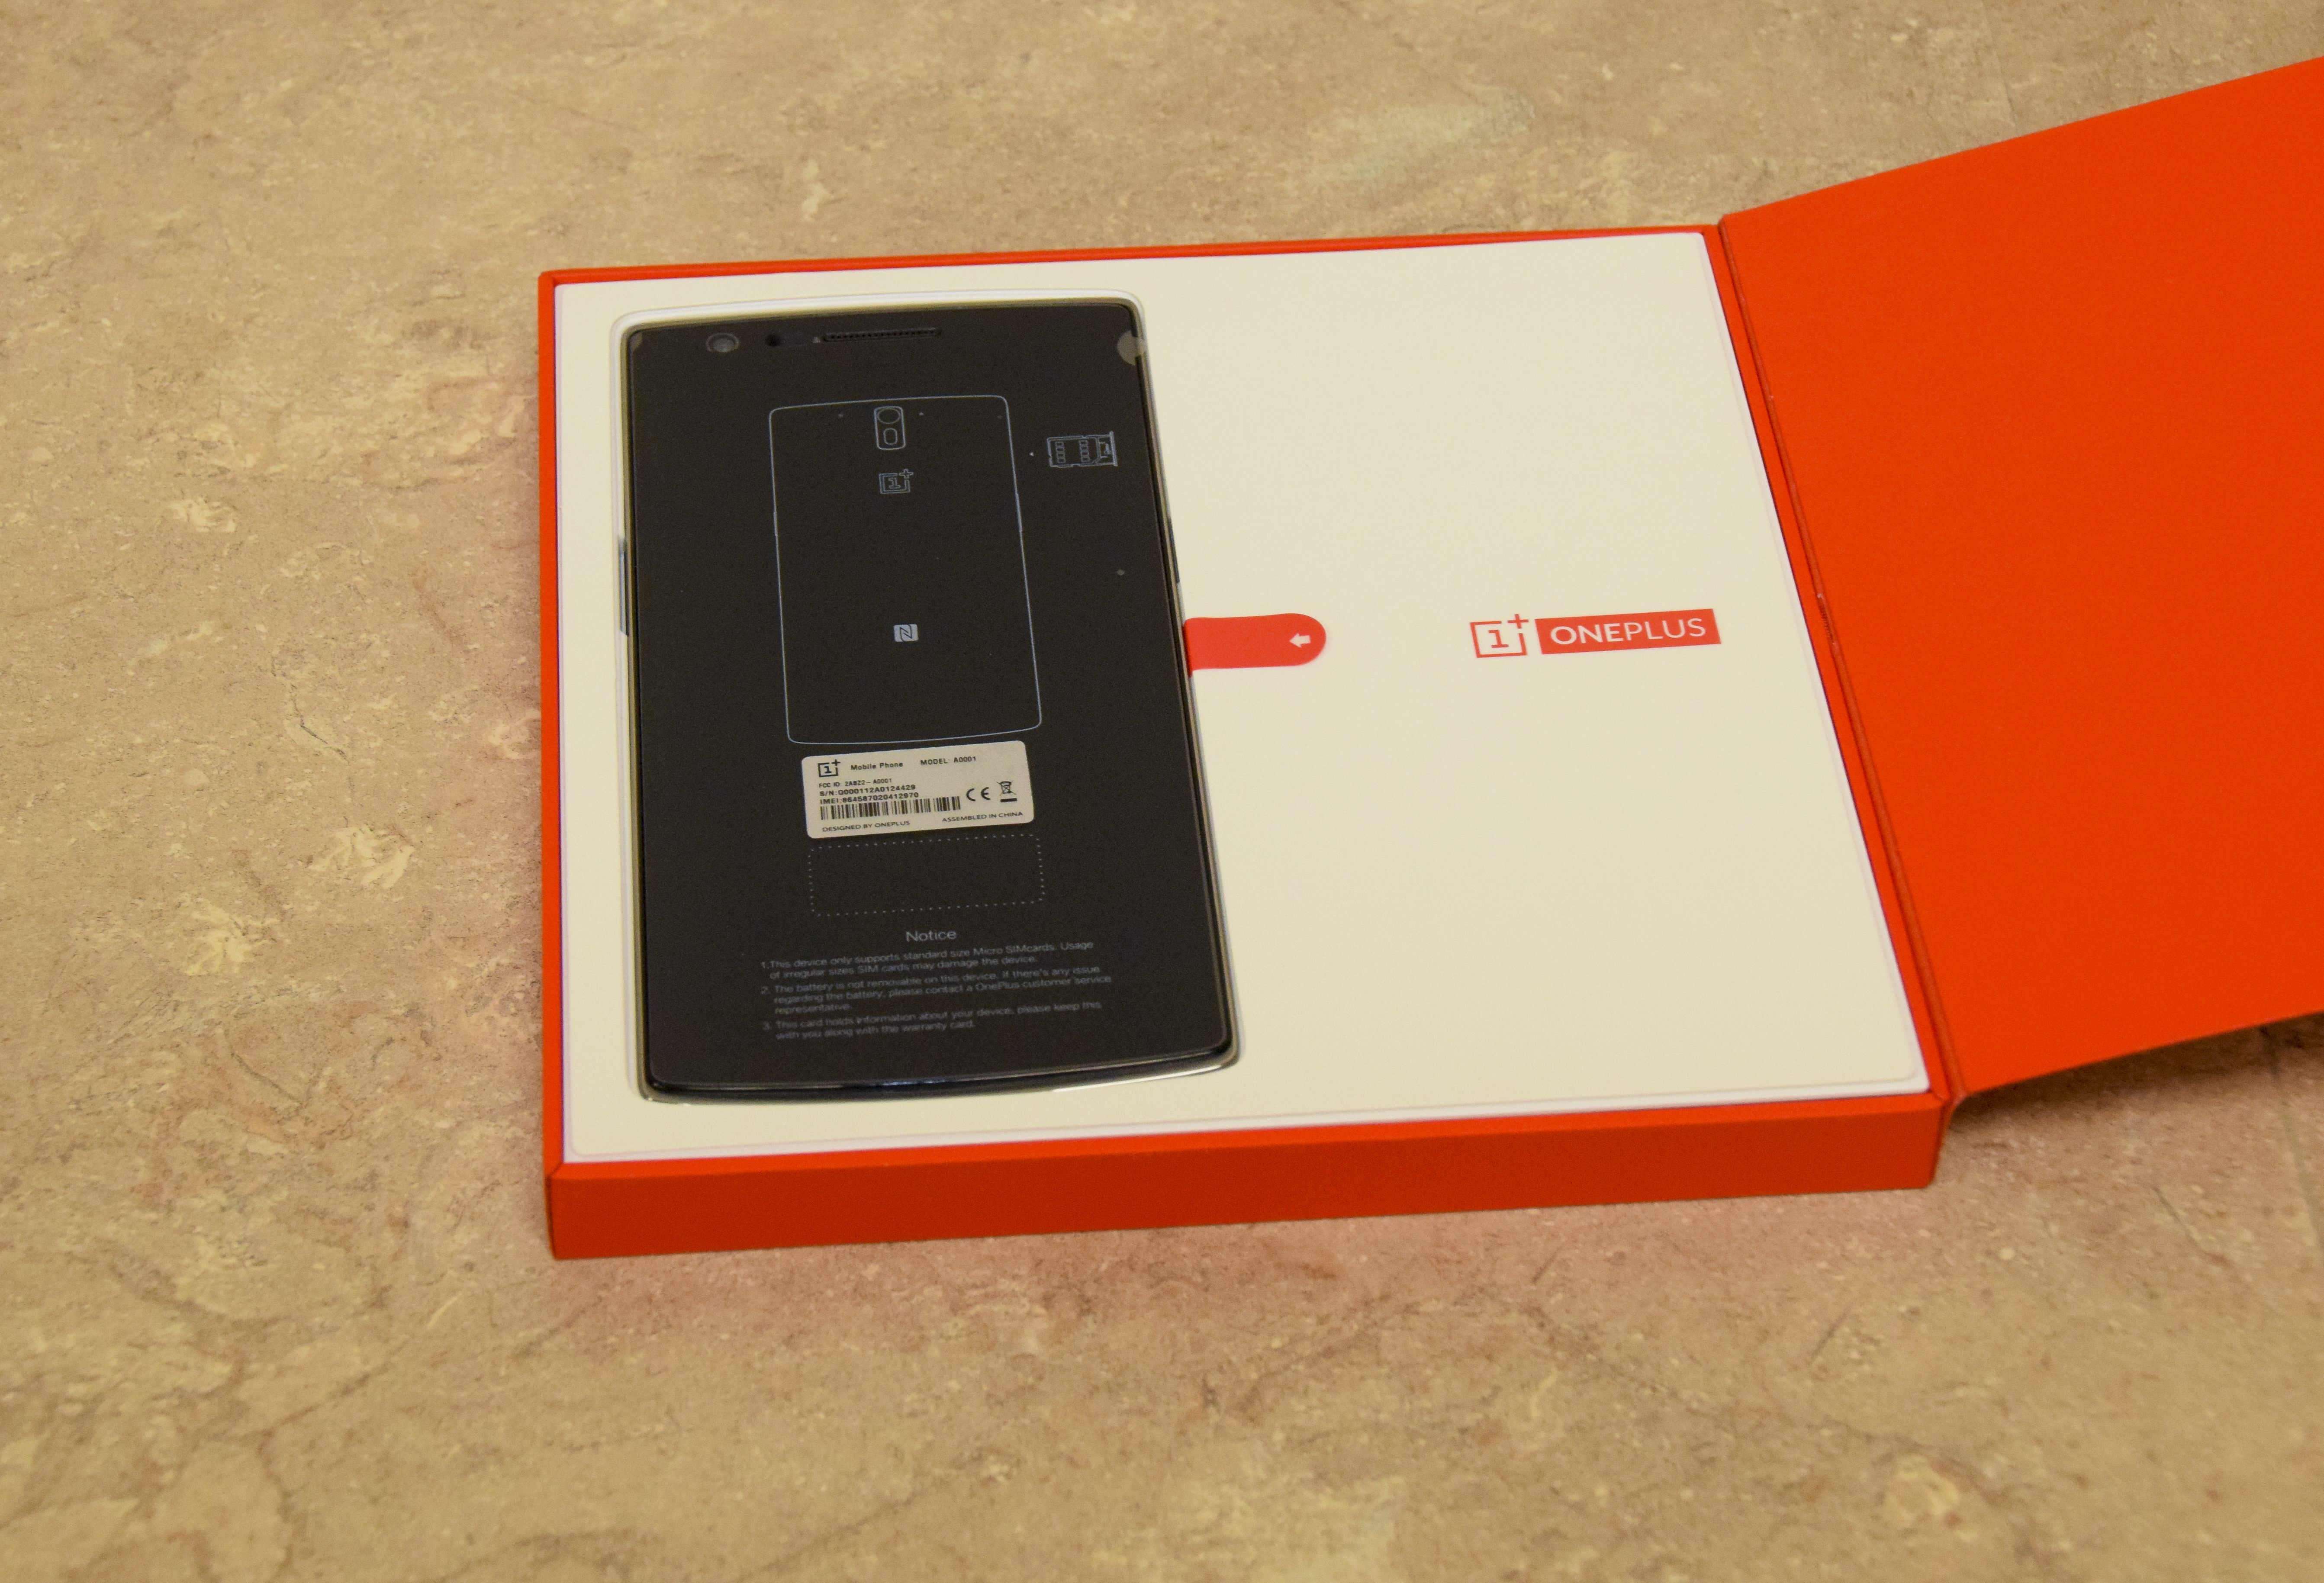 OnePlus One Box Opened